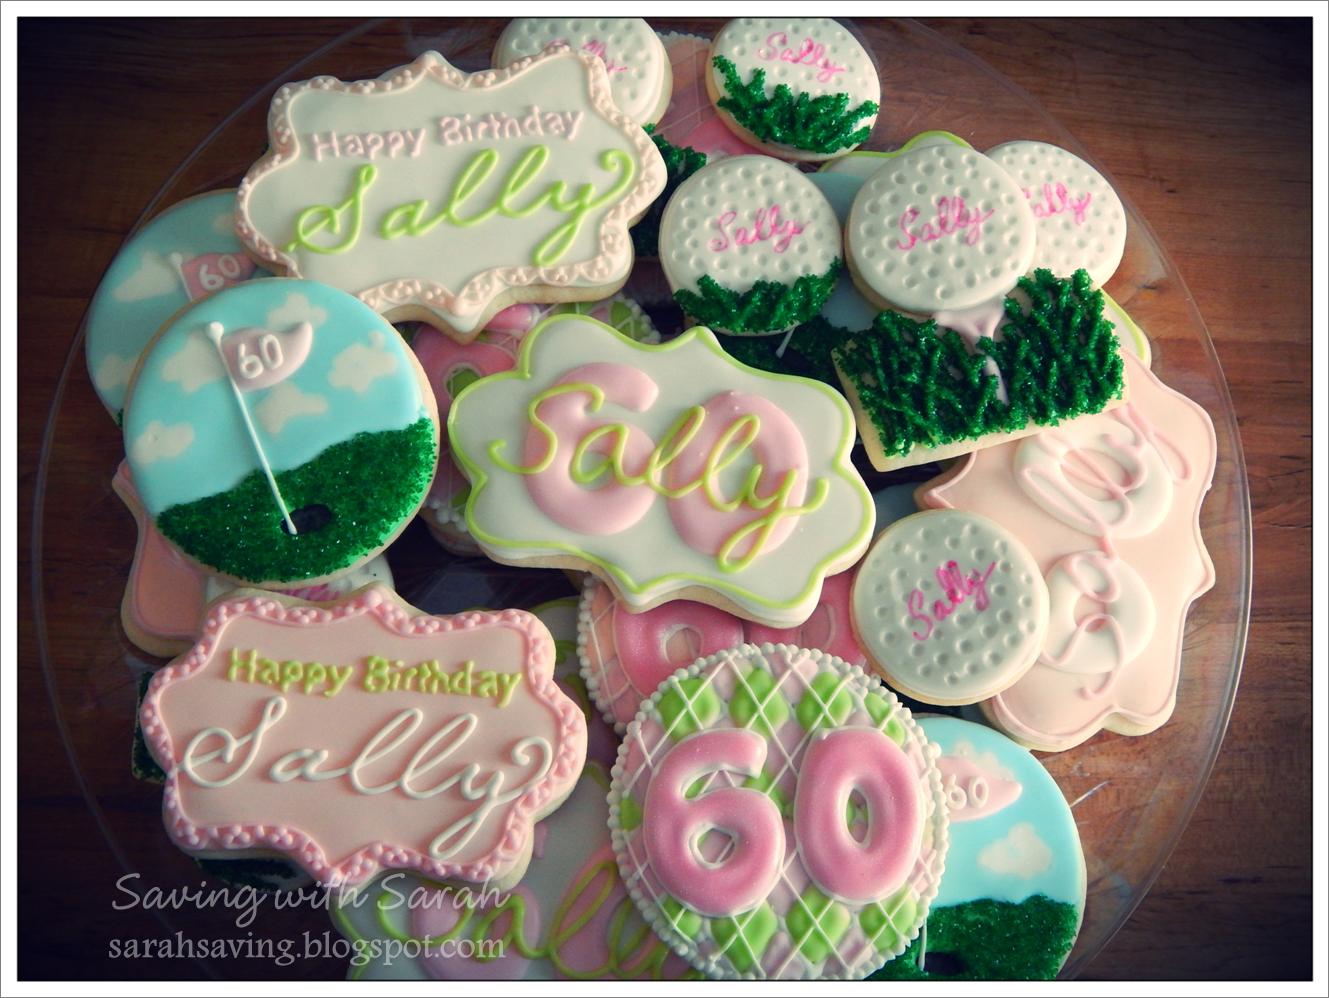 Golf Birthday Cookies decorated cookies, #golfcookies #golfbirthday